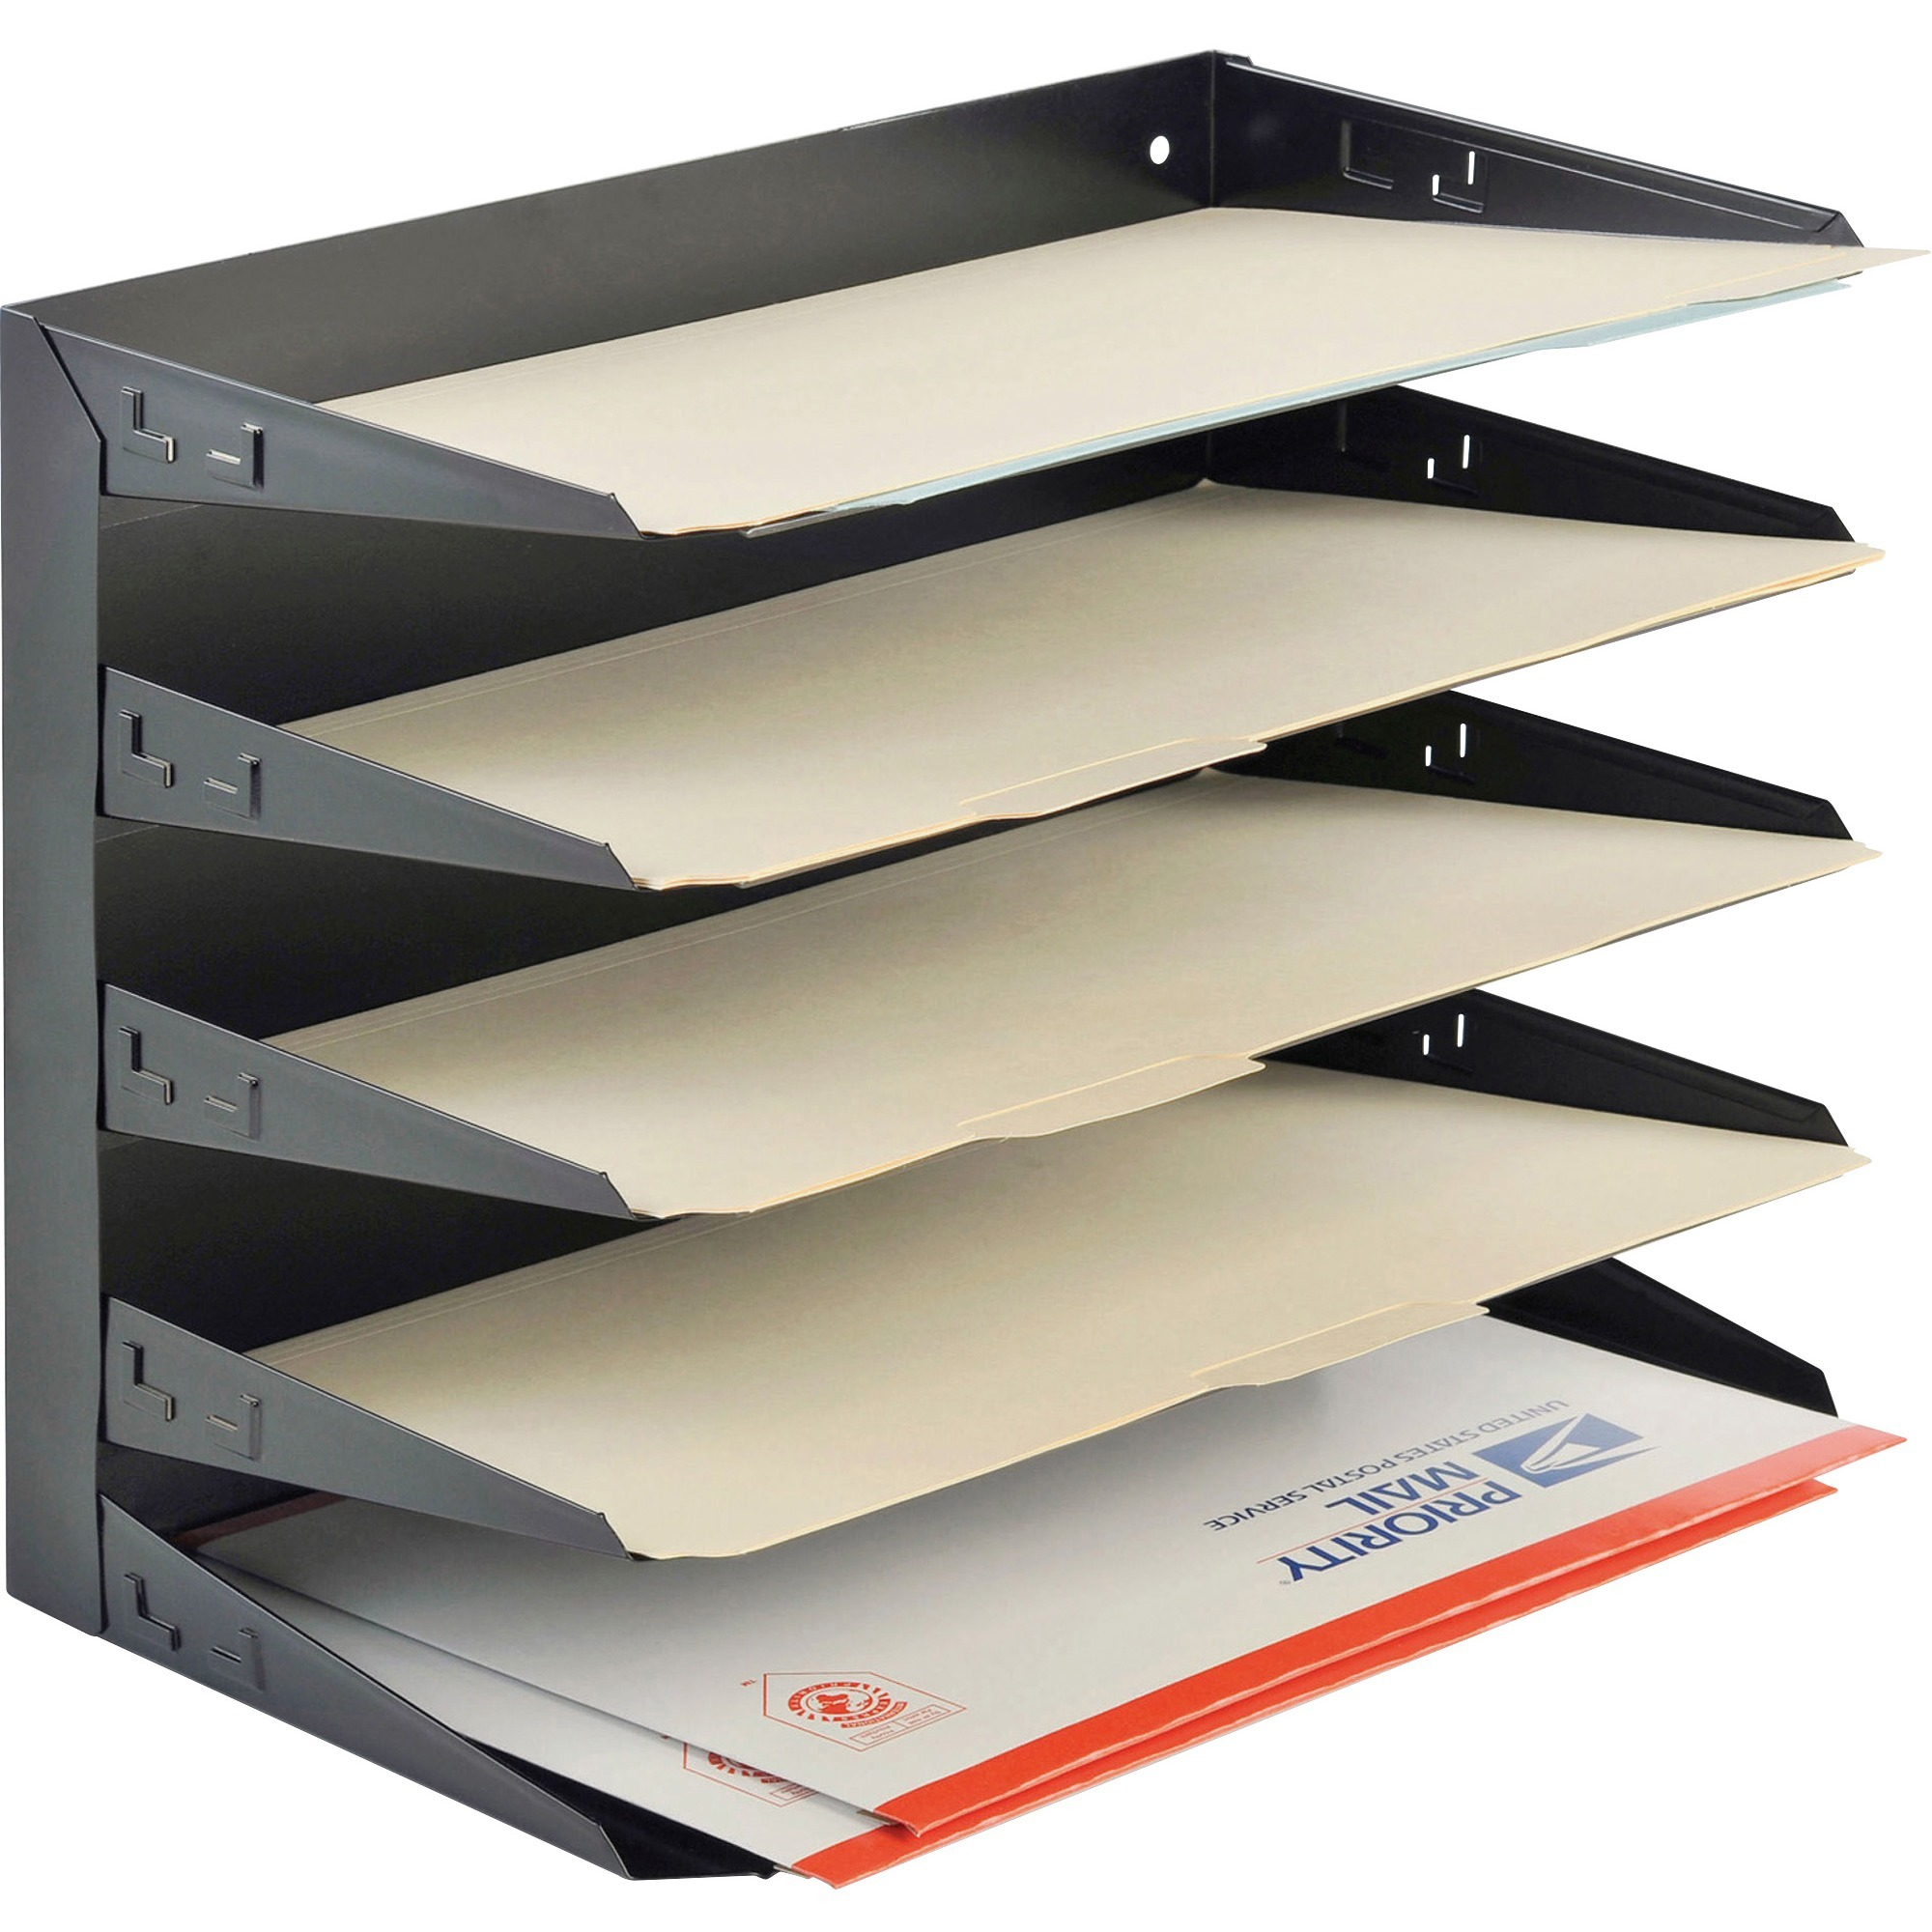 wayfair reviews folder industrious pdx and drawers pockets organizer with furniture desktop kate file desk laurel paper